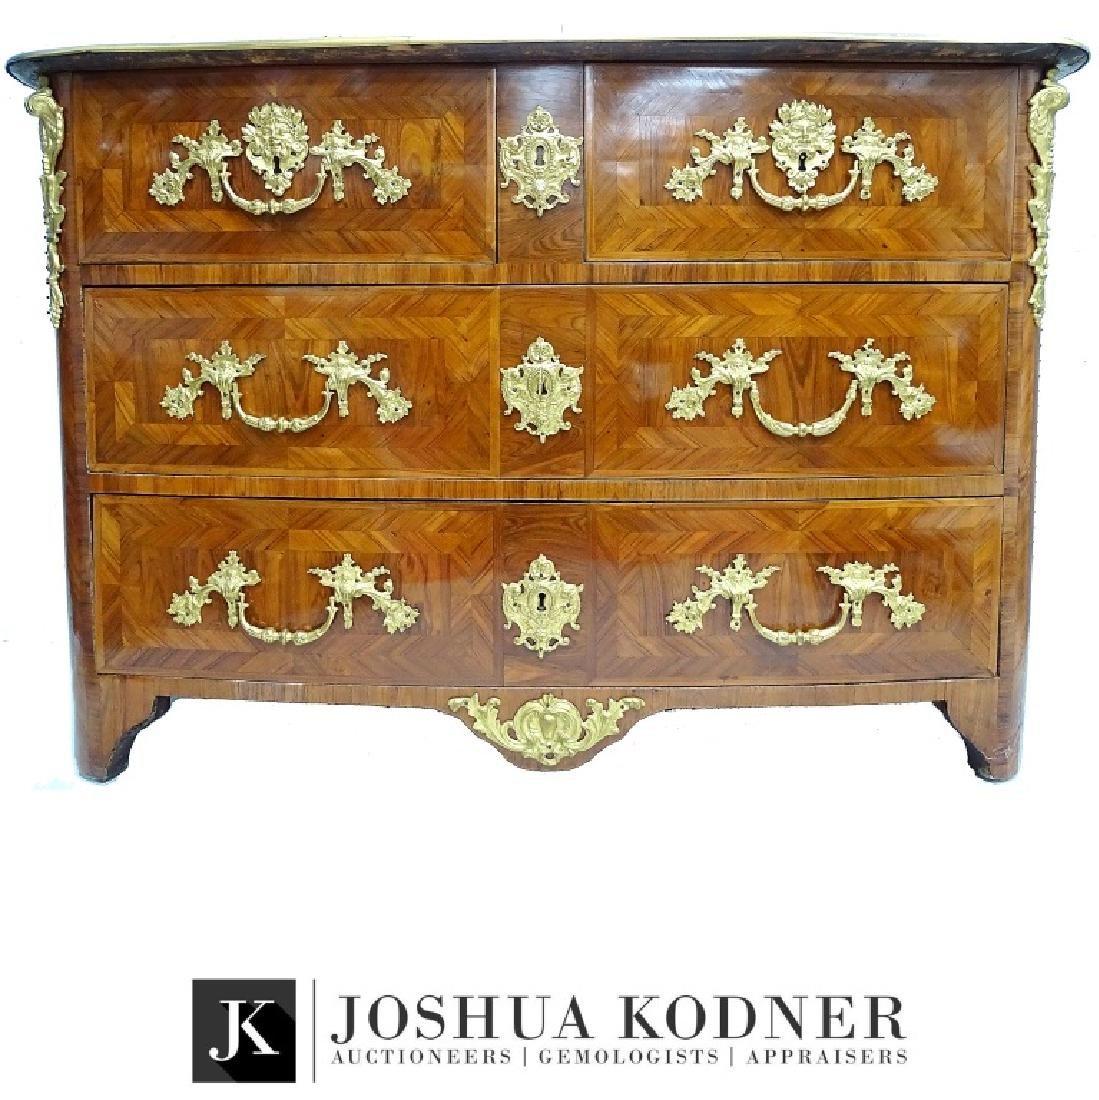 A Régence gilt-bronze mounted kingwood parquetry